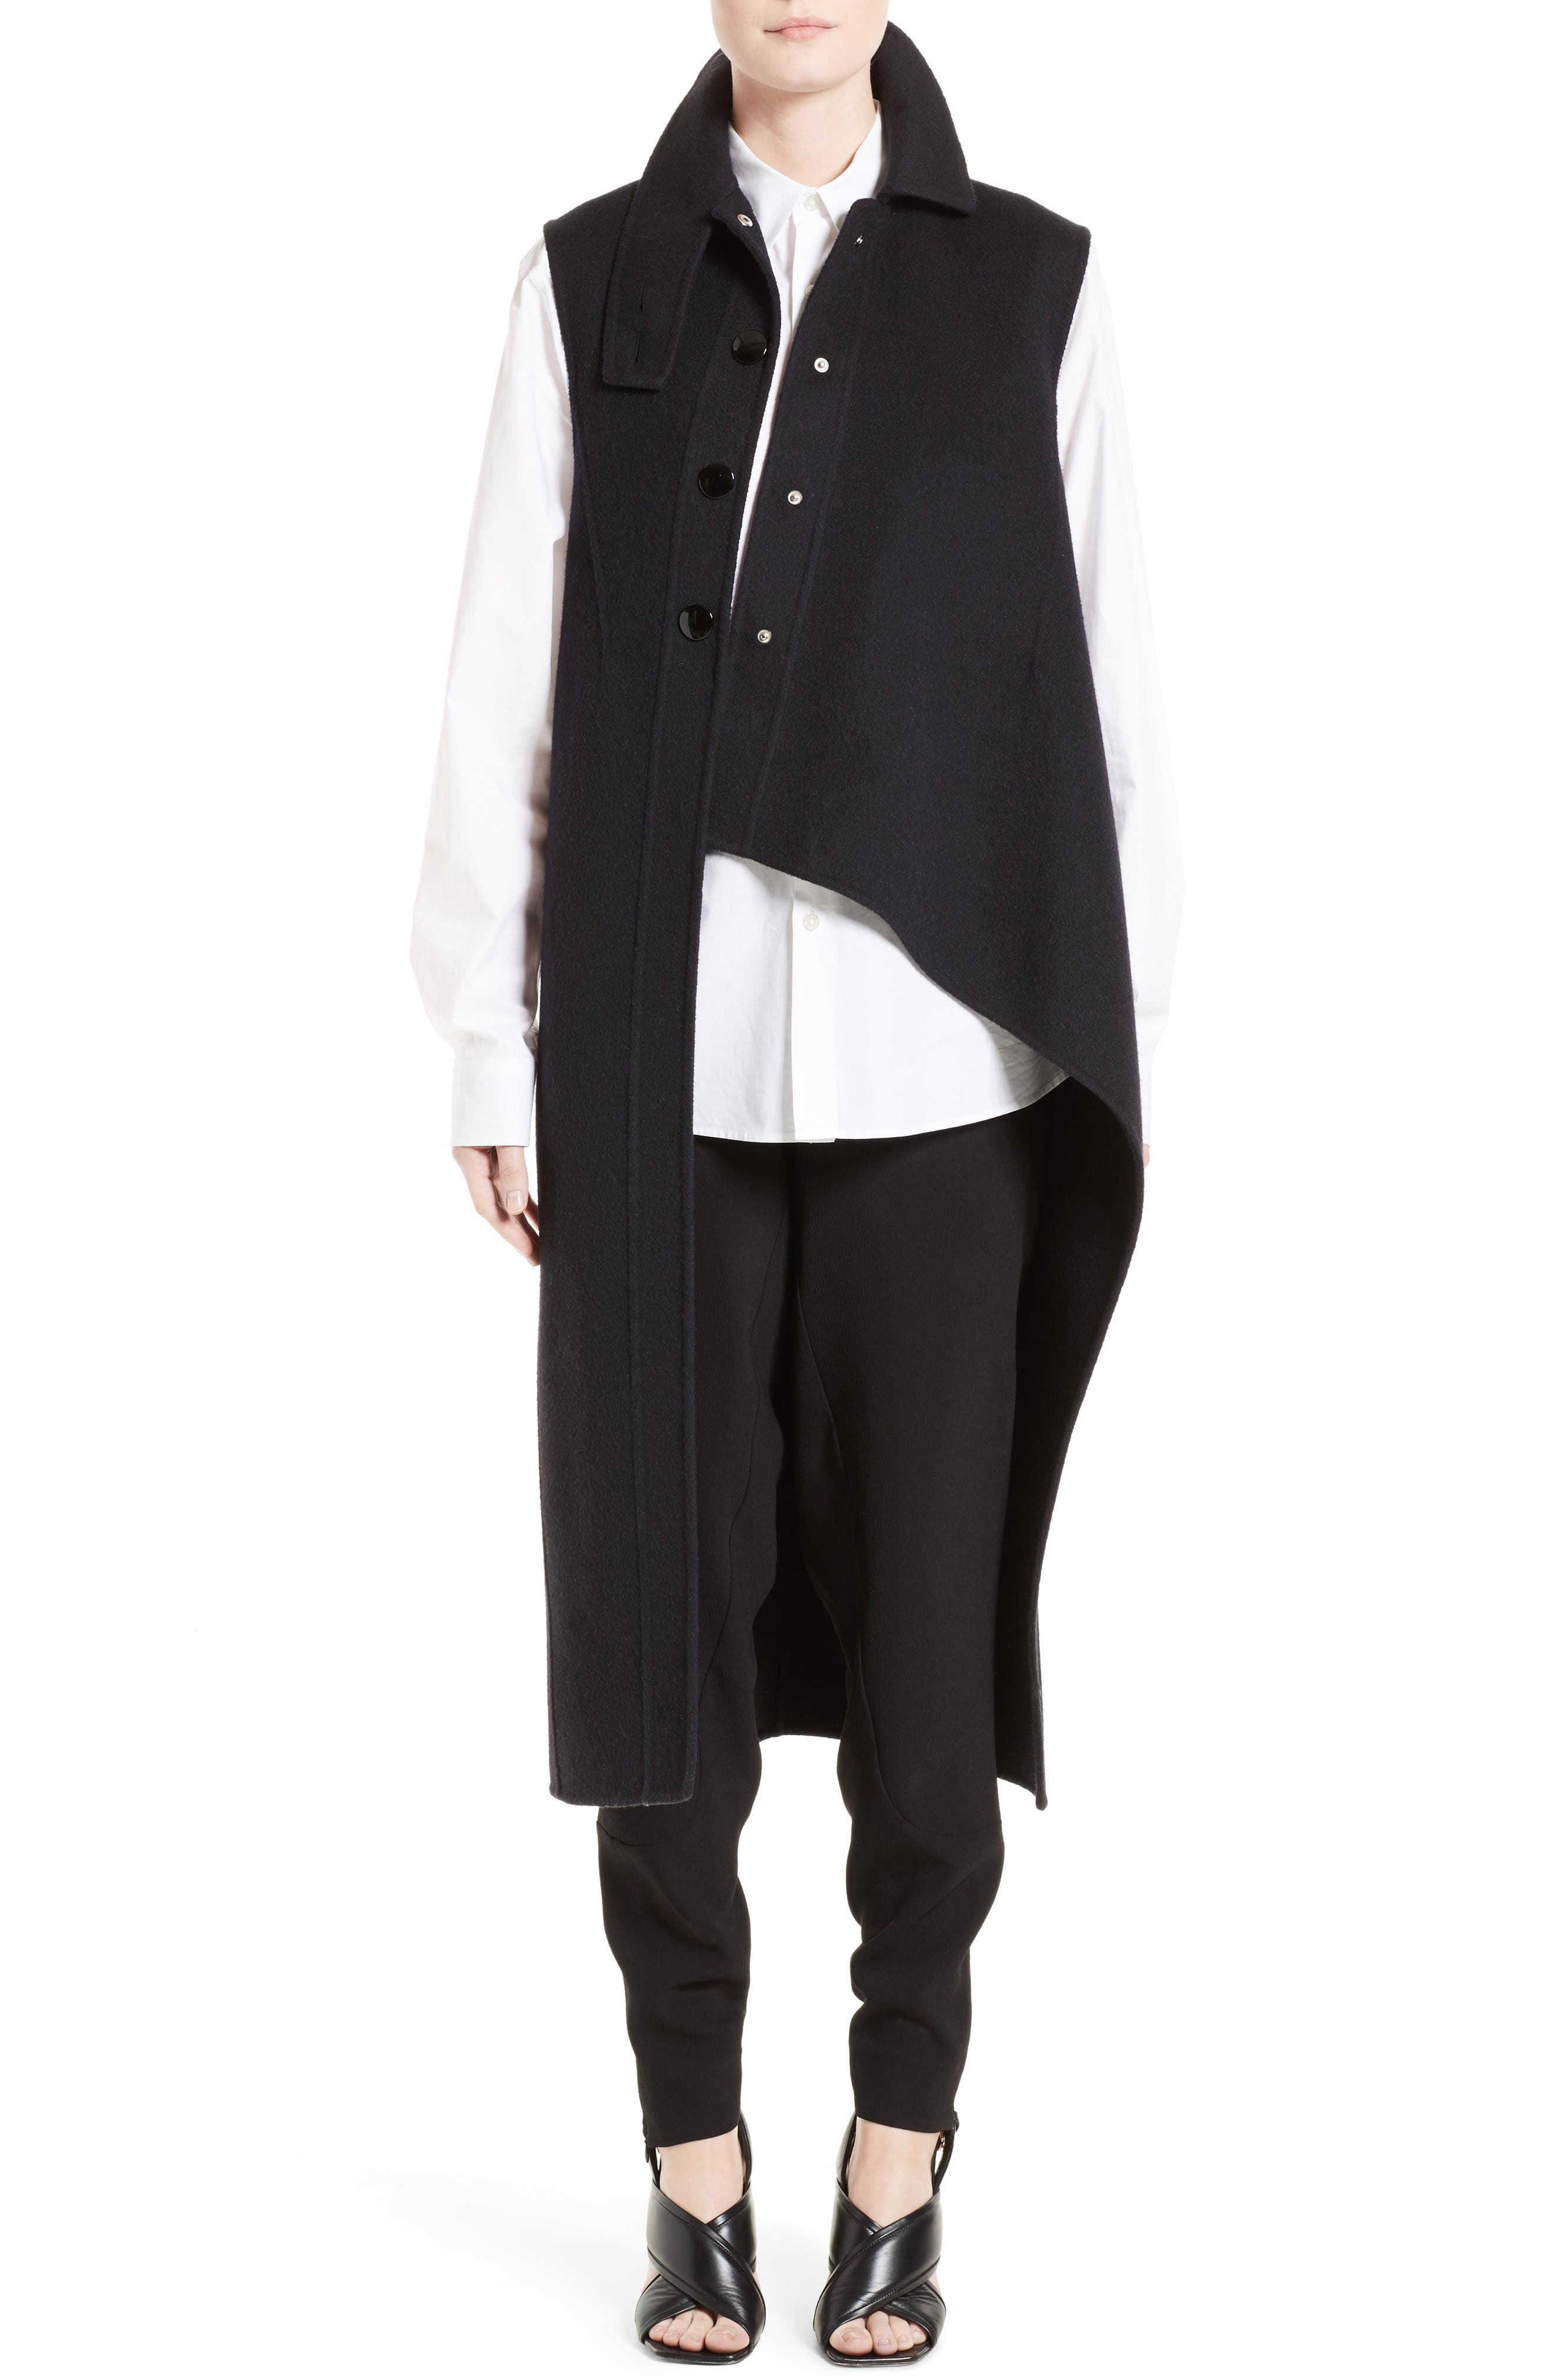 Marni Wool, Alpaca & Cashmere Asymmetrical Vest